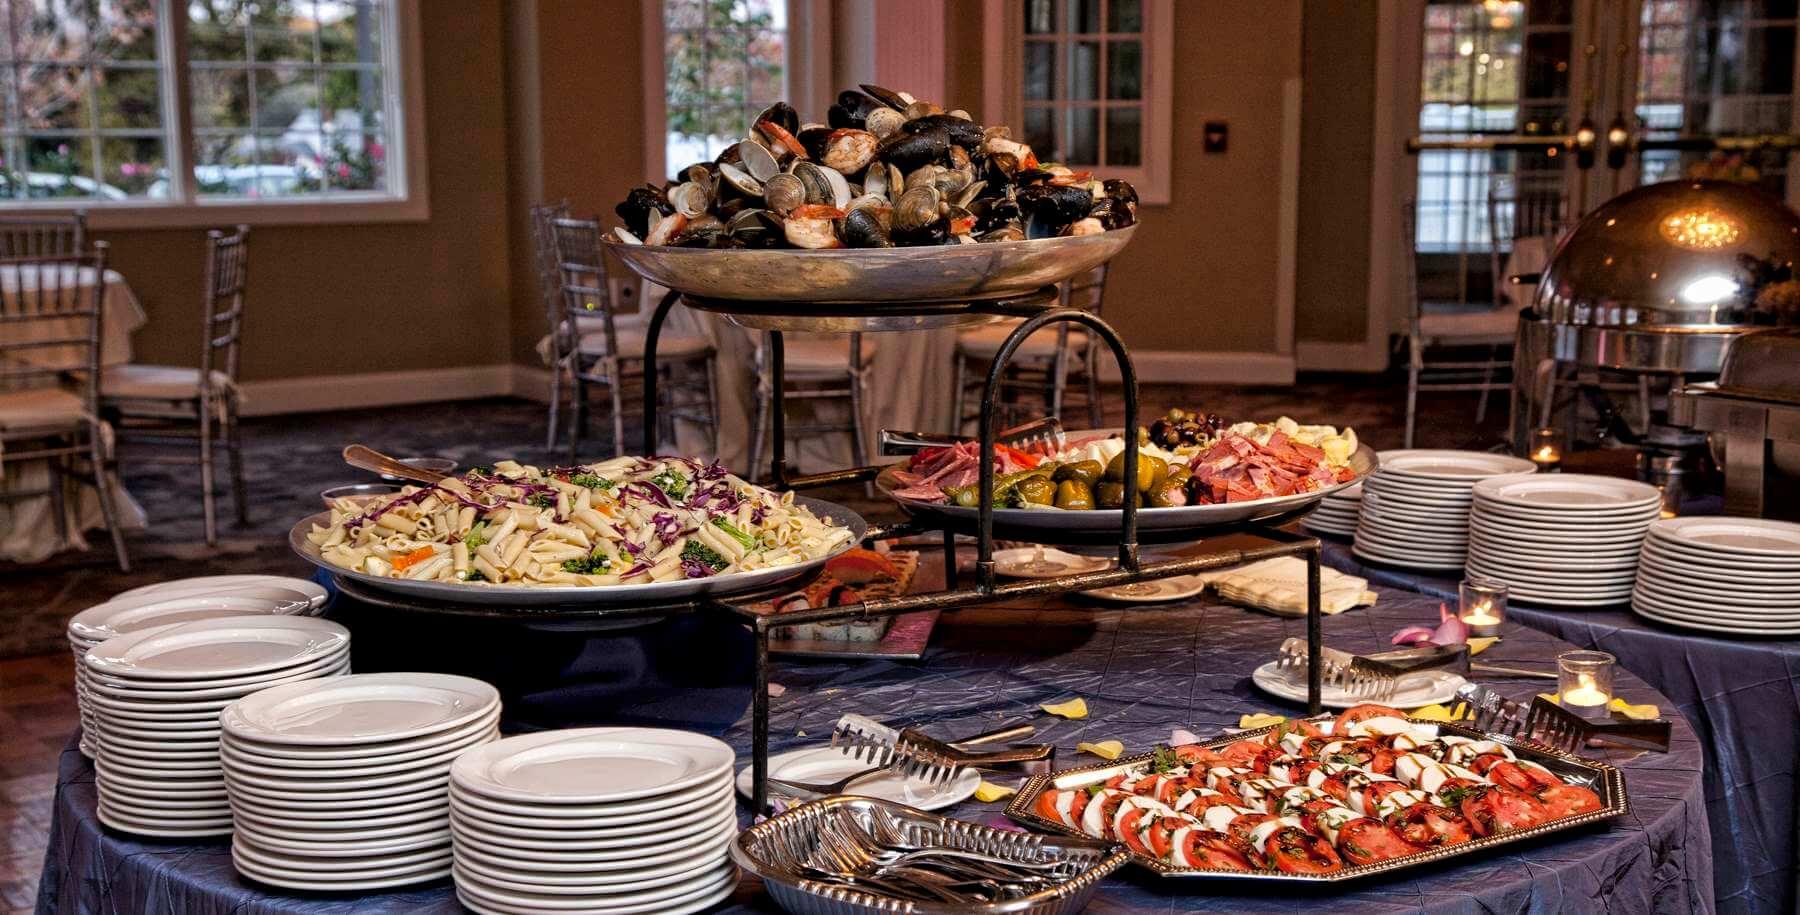 Buffet menu. Buffet table for birthday 80